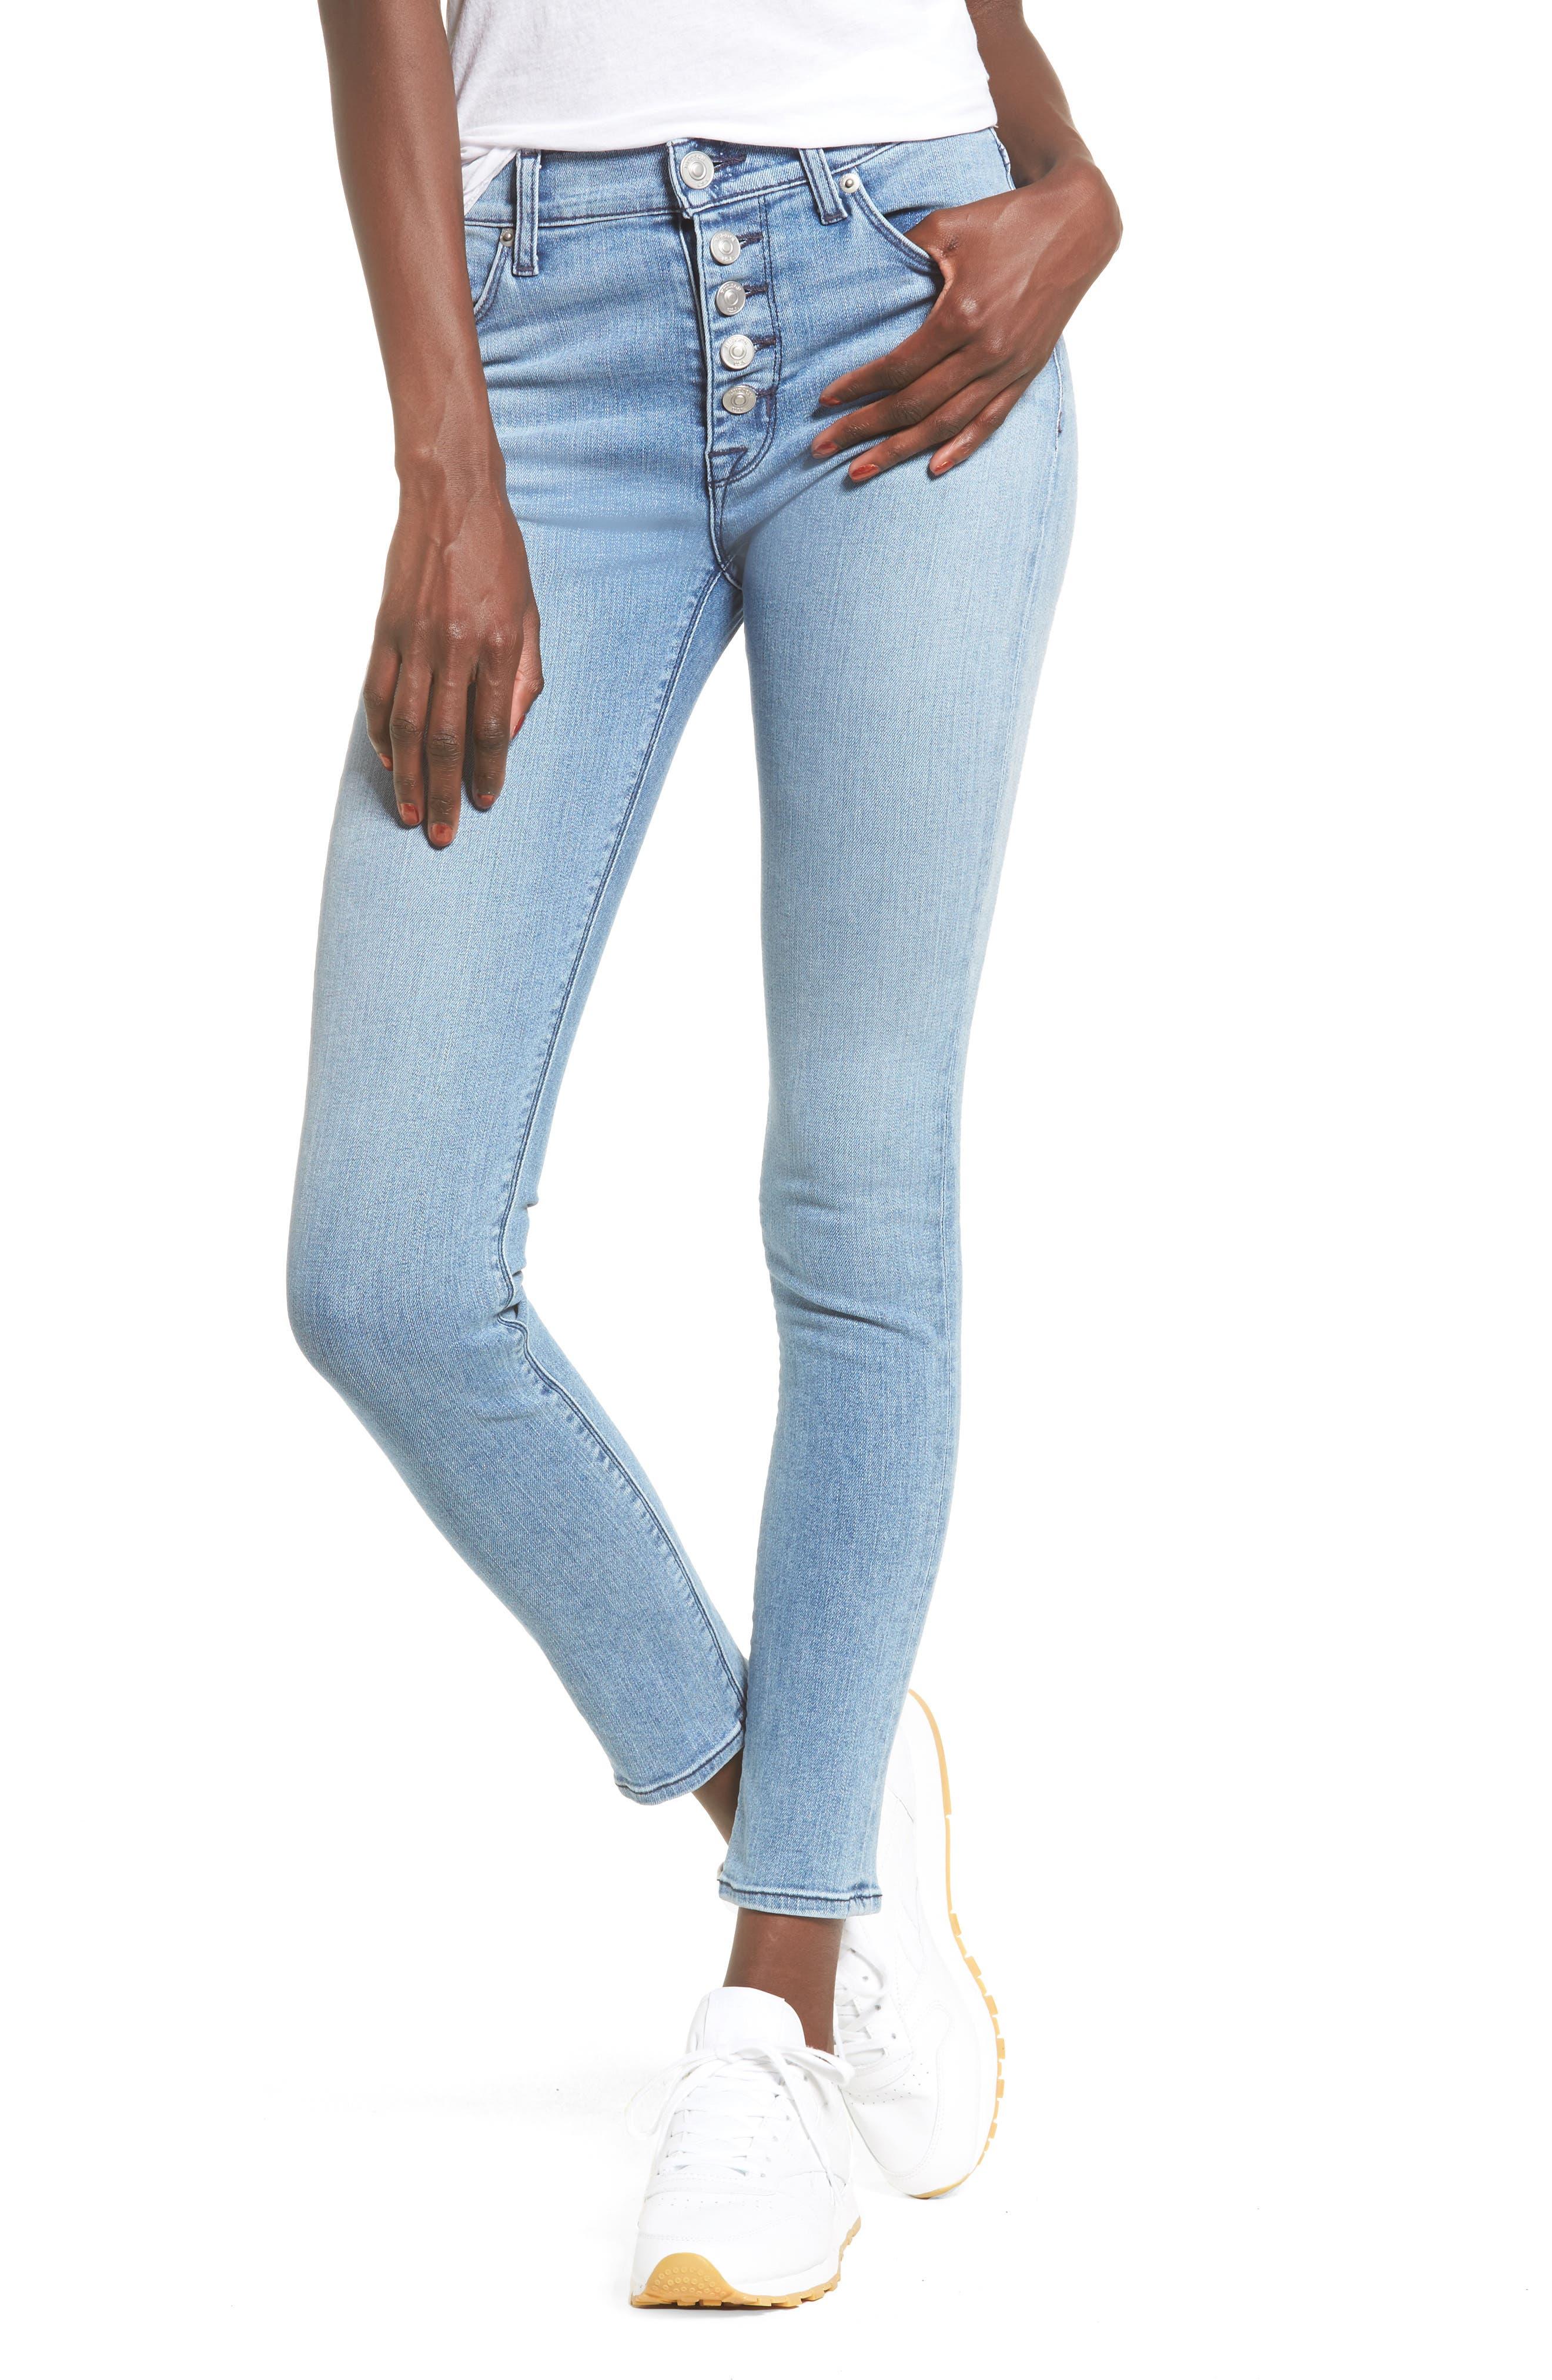 HUDSON JEANS Ciara High Waist Skinny Jeans